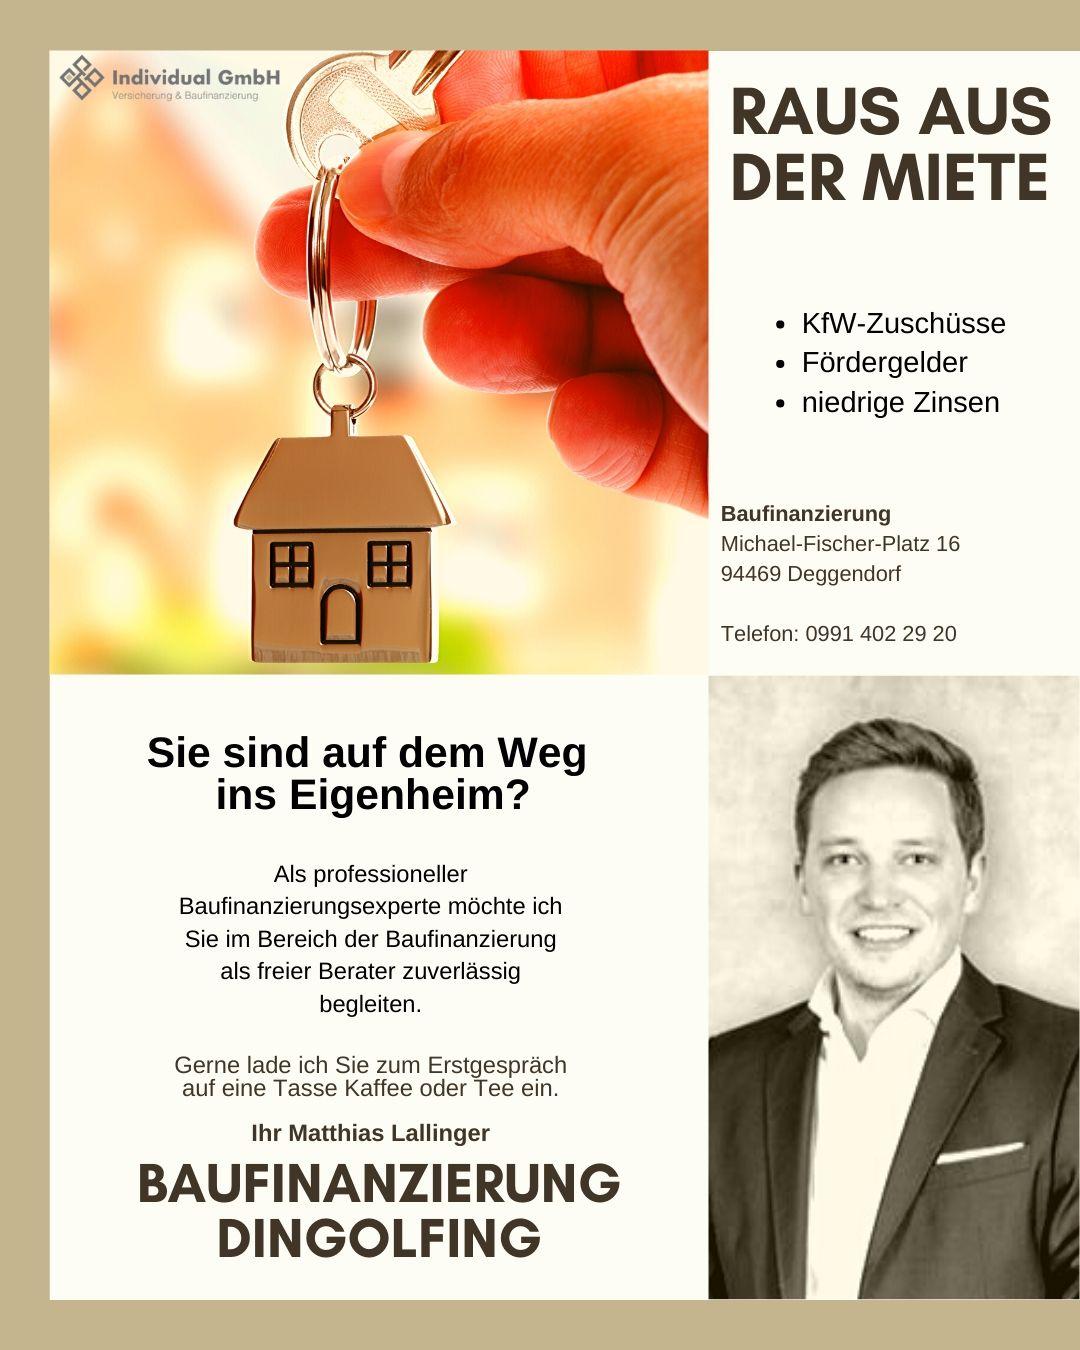 Baufinanzierung Dingolfing - Matthias Lallinger - Raus aus der Miete